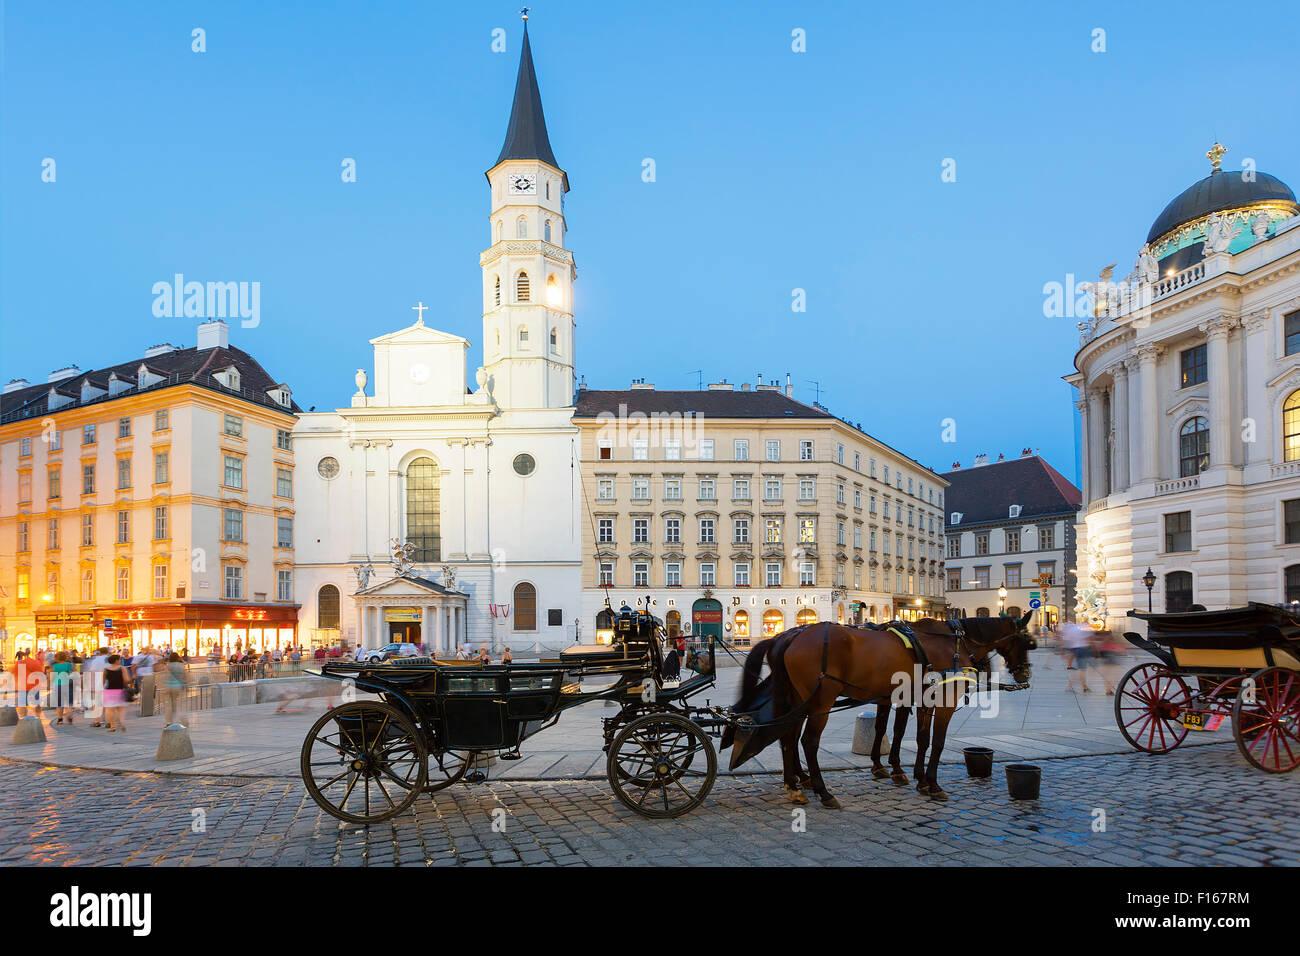 Horse carriage, Josefsplatz, Vienna, Austria - Stock Image